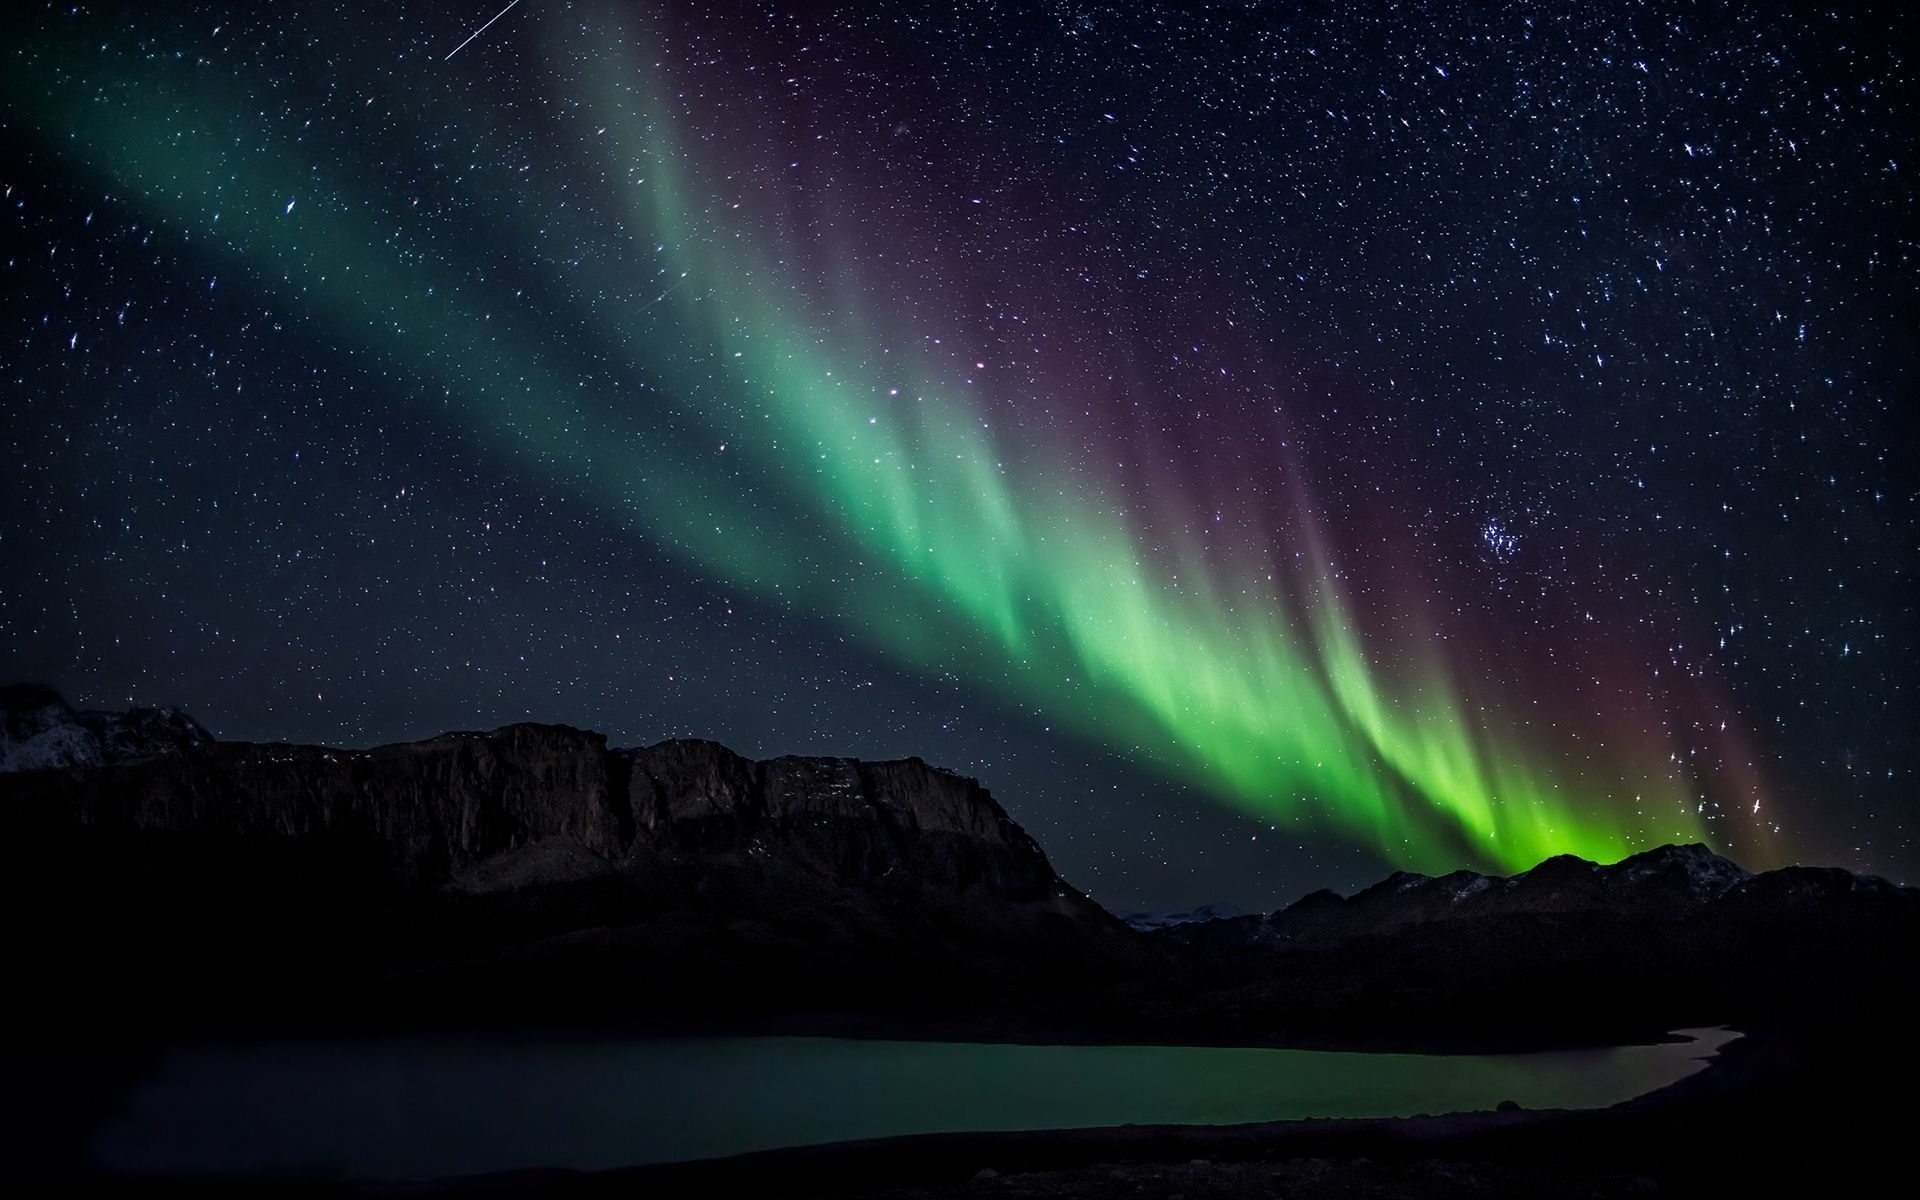 aurora borealis wallpapers hd wallpaper | hd wallpapers